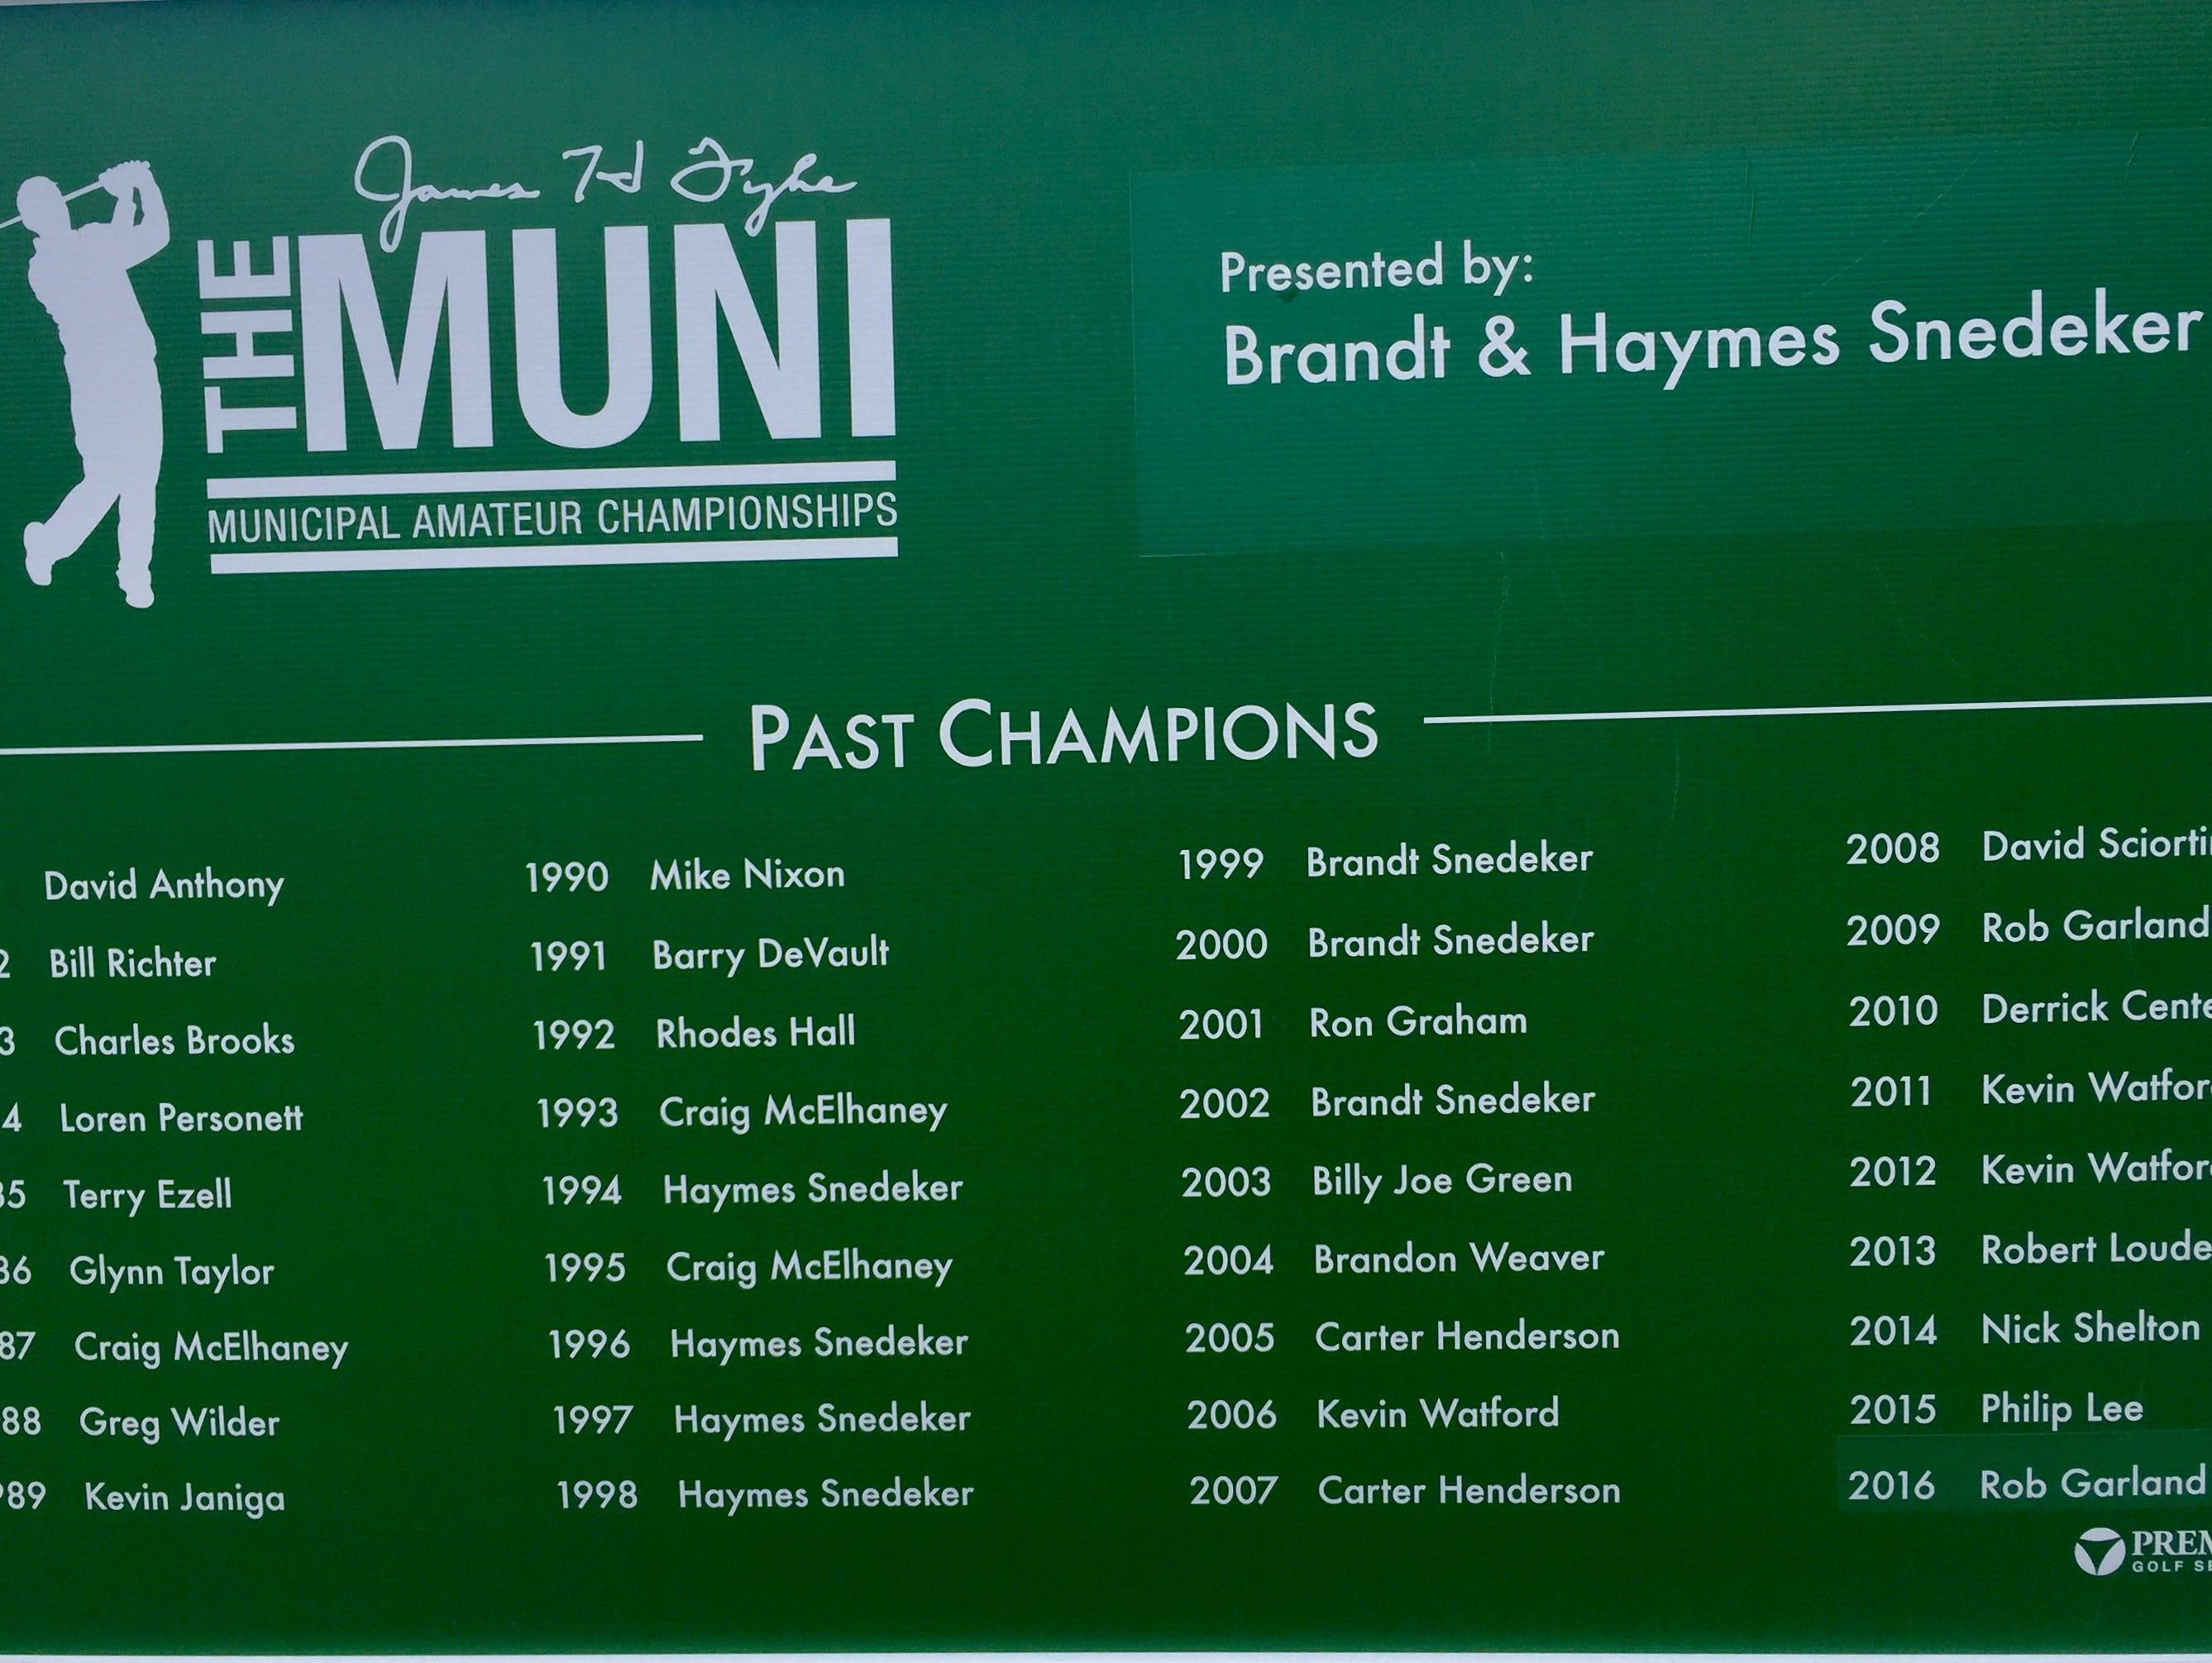 Past champions of the James H. Fyke Municipal Amateur Championship.